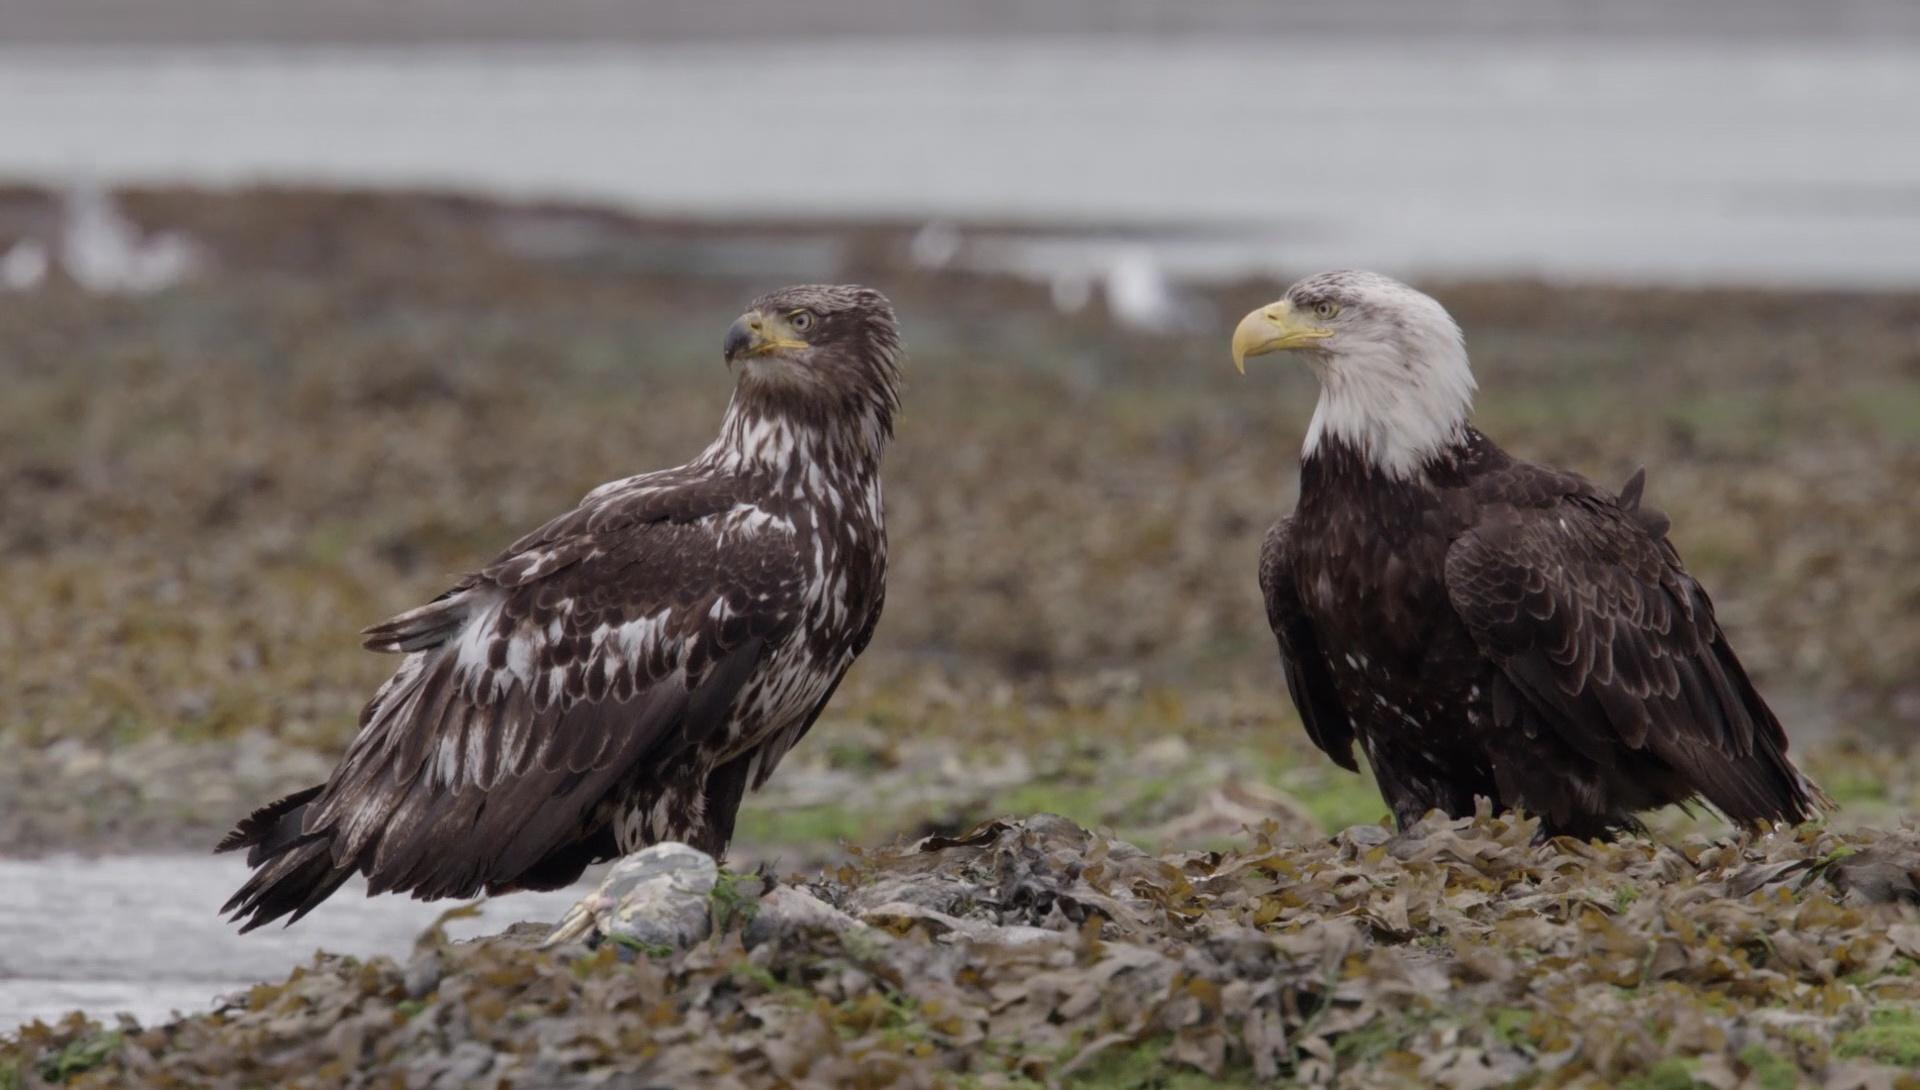 Wild Moments: Eagles